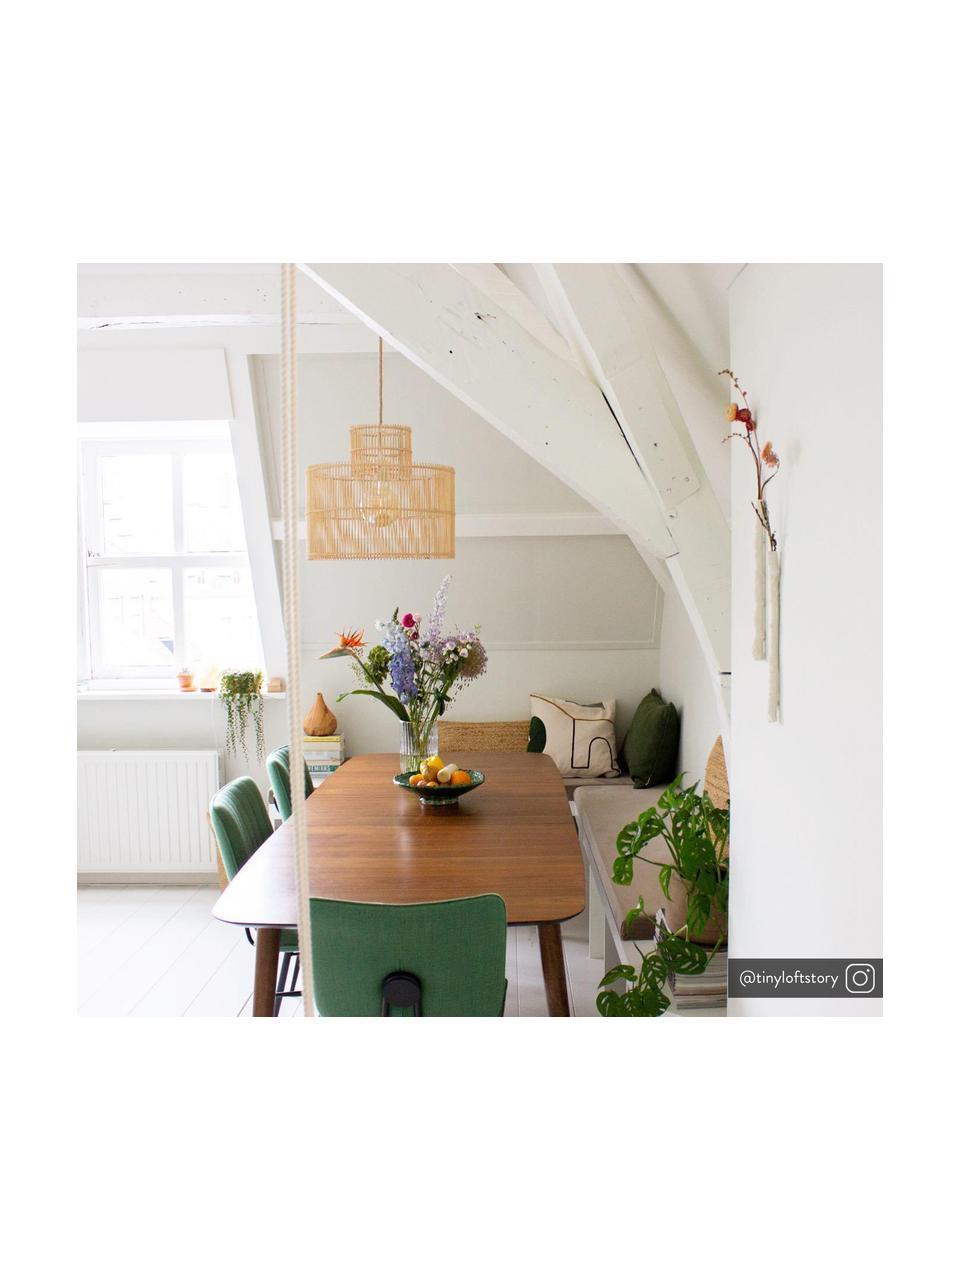 Uitschuifbare eettafel Cirrus, Tafelblad: MDF (Medium-density fibre, Poten: gelakt eikenhout, Mat eikenhoutkleurig, B 190-235 x D 90 cm